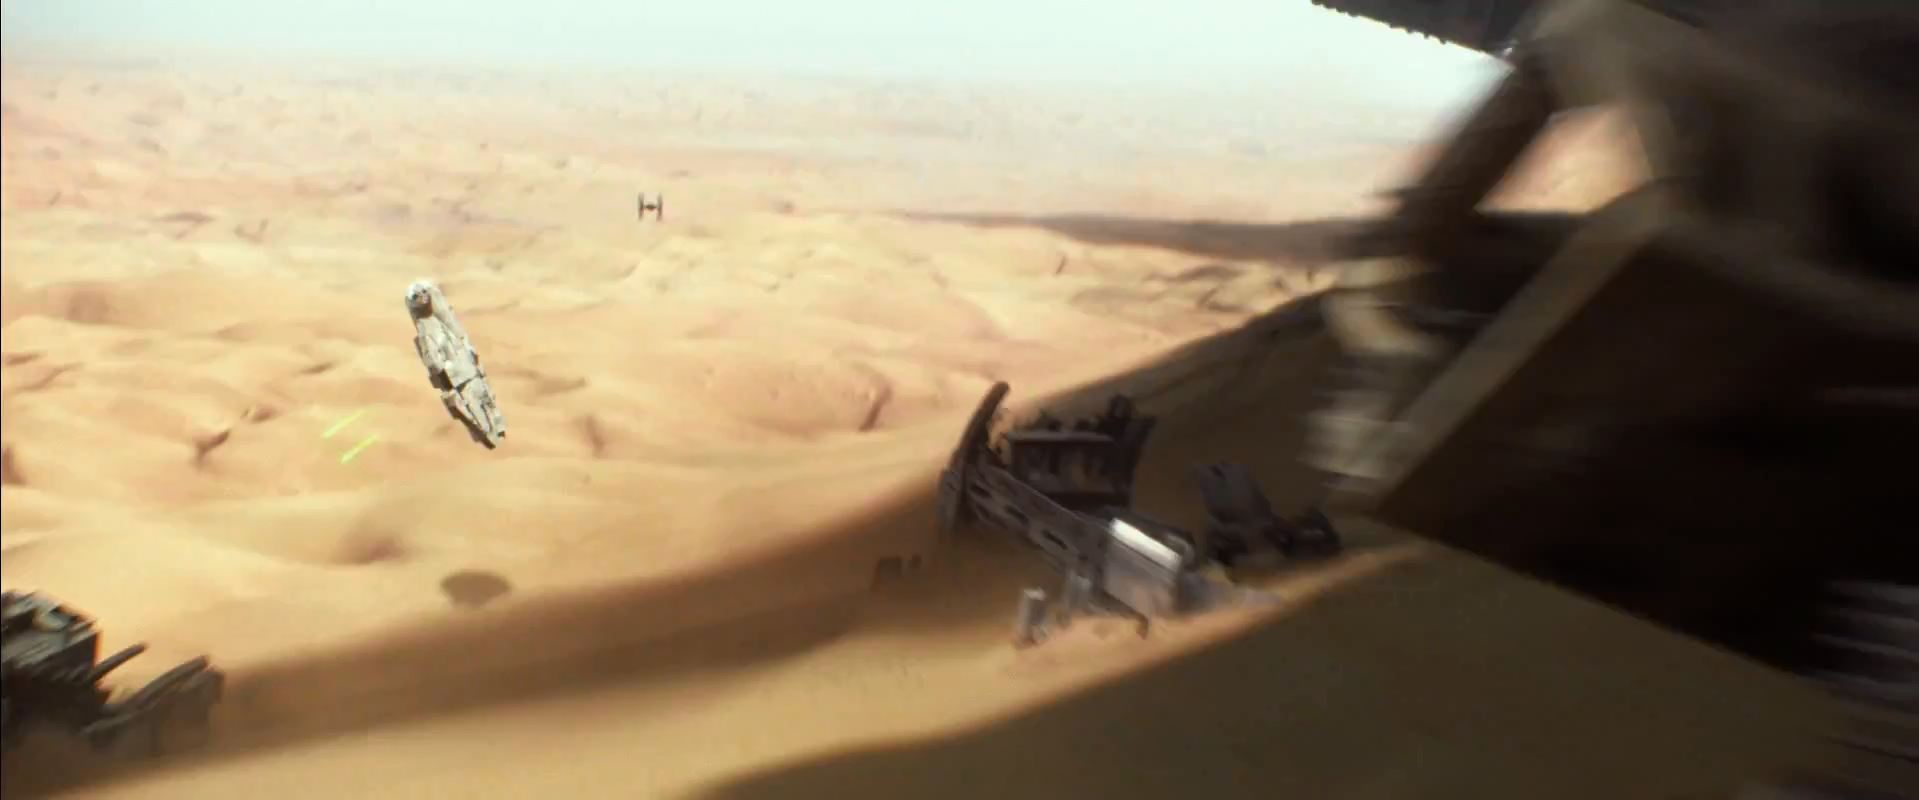 Milennium Falcon chased